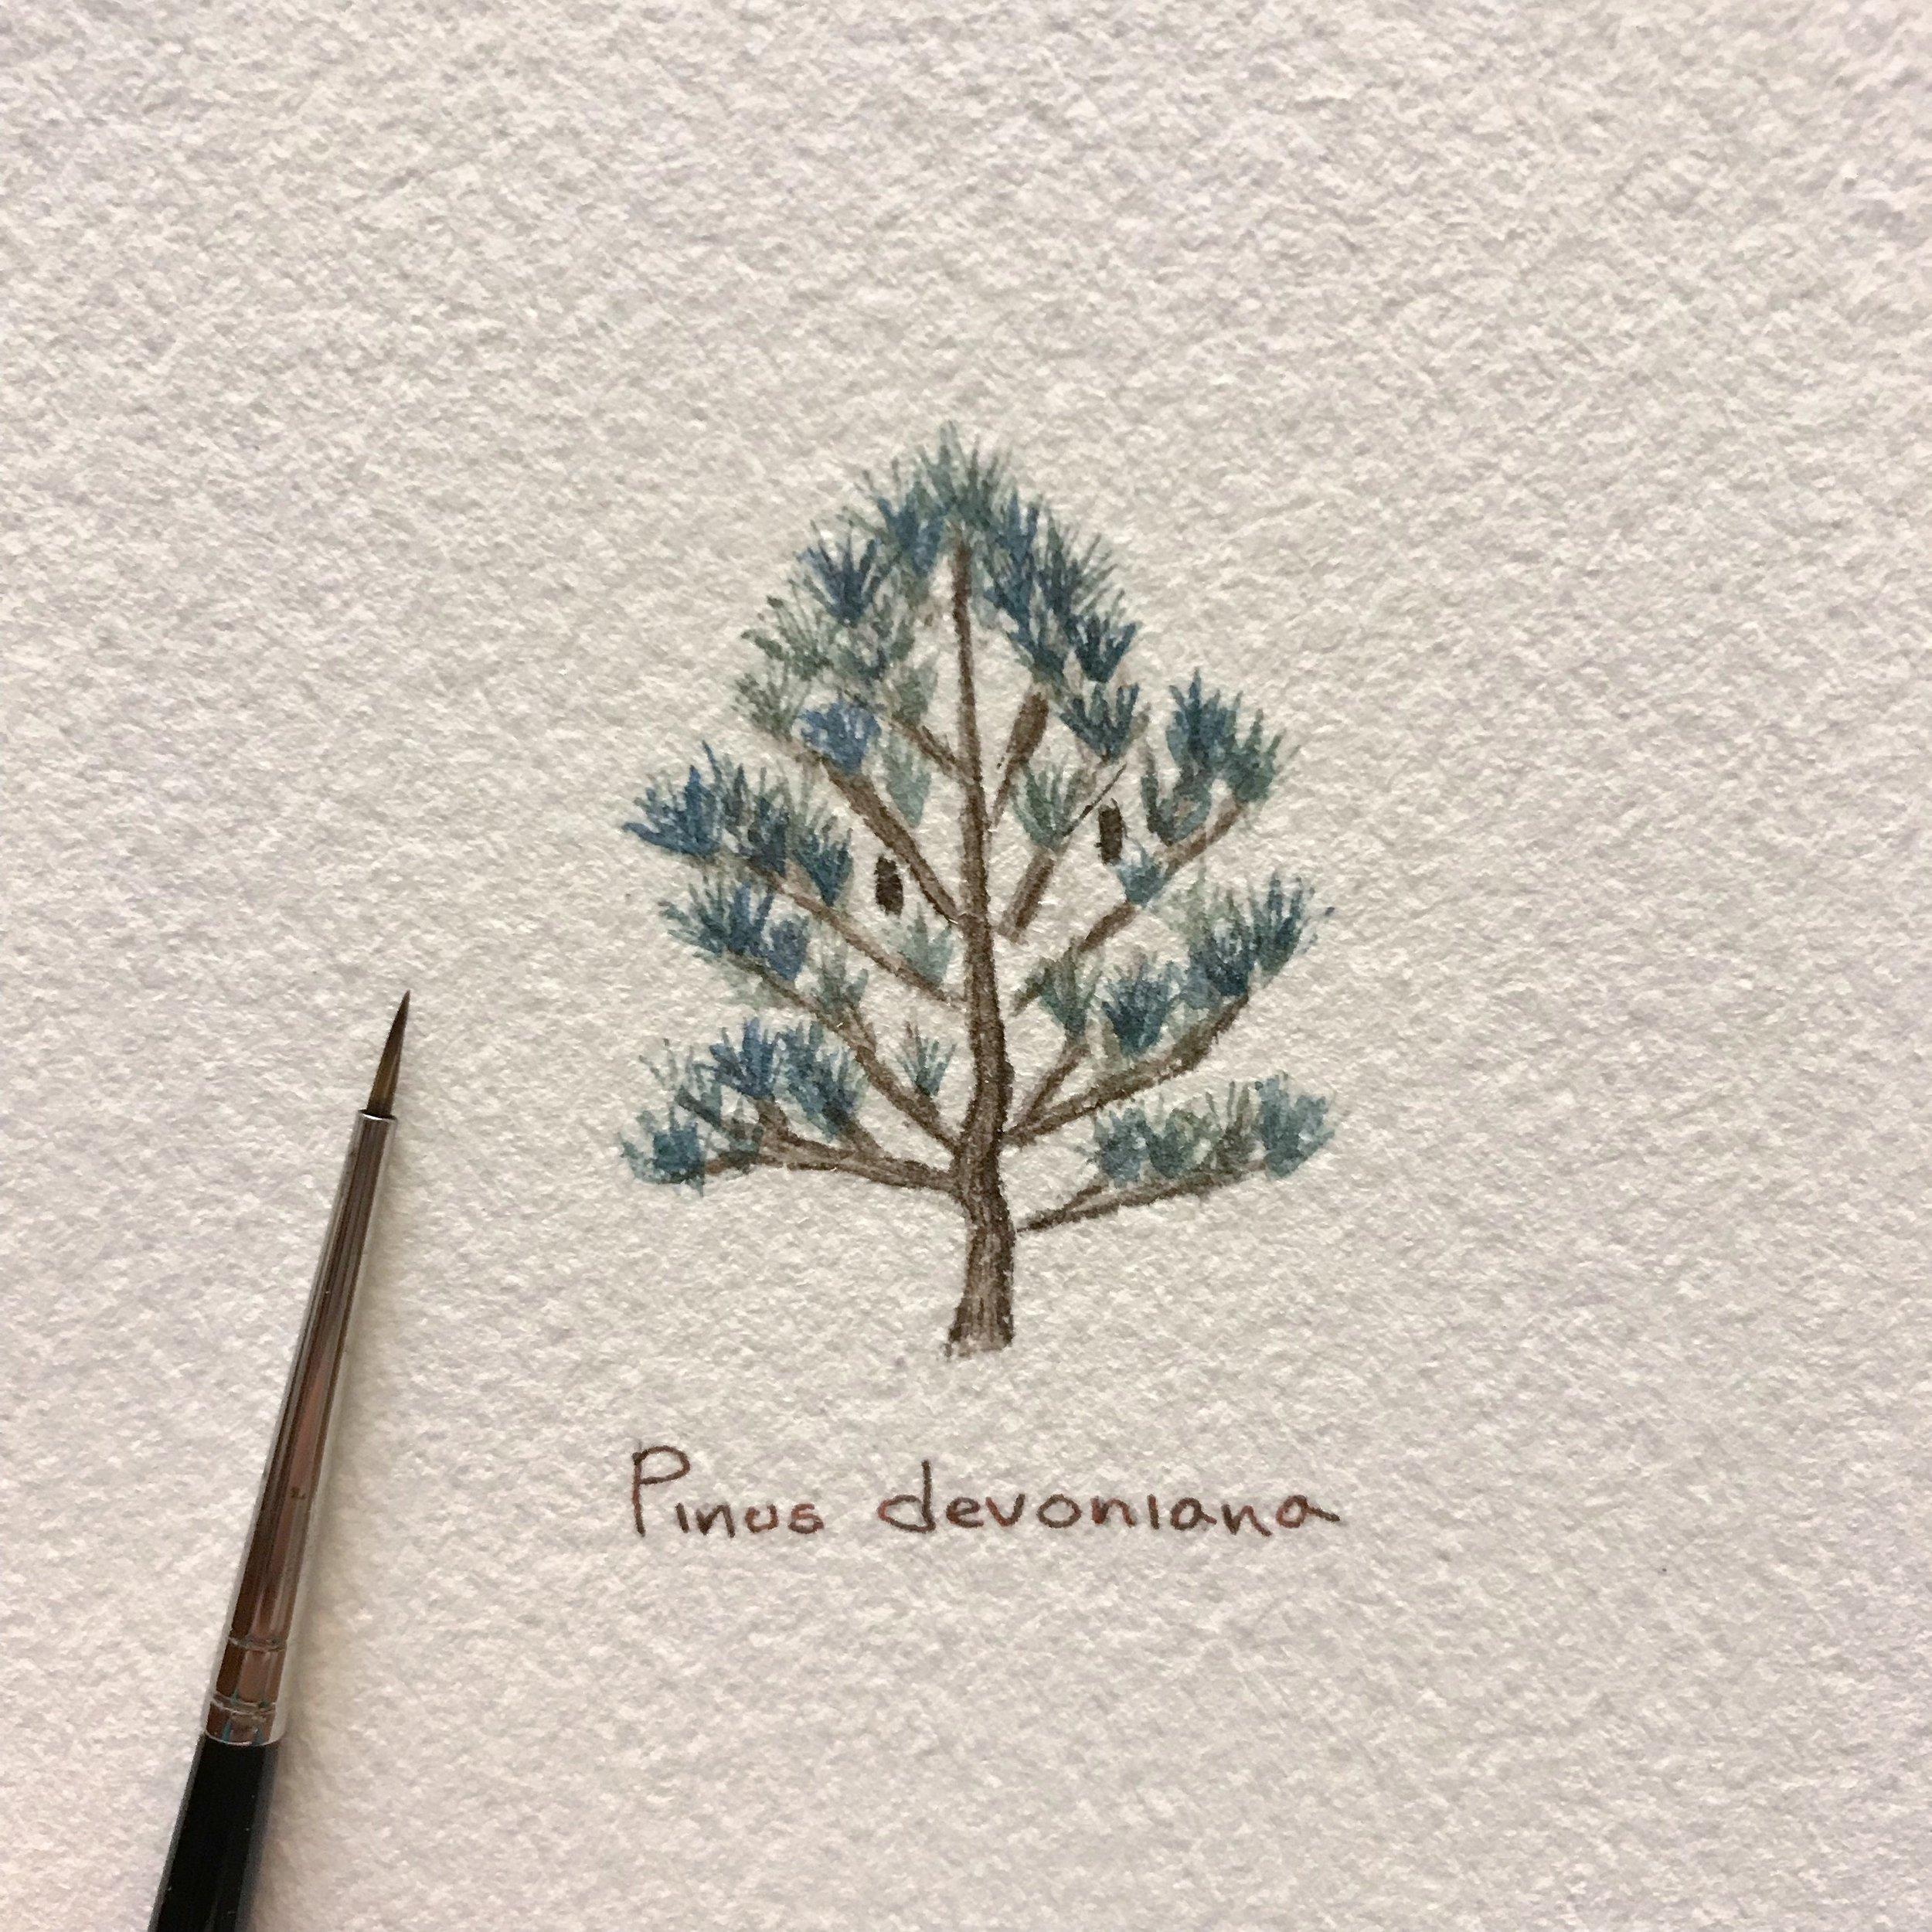 #PlantSaturday: Pinus devoniana - Pino Michoacano